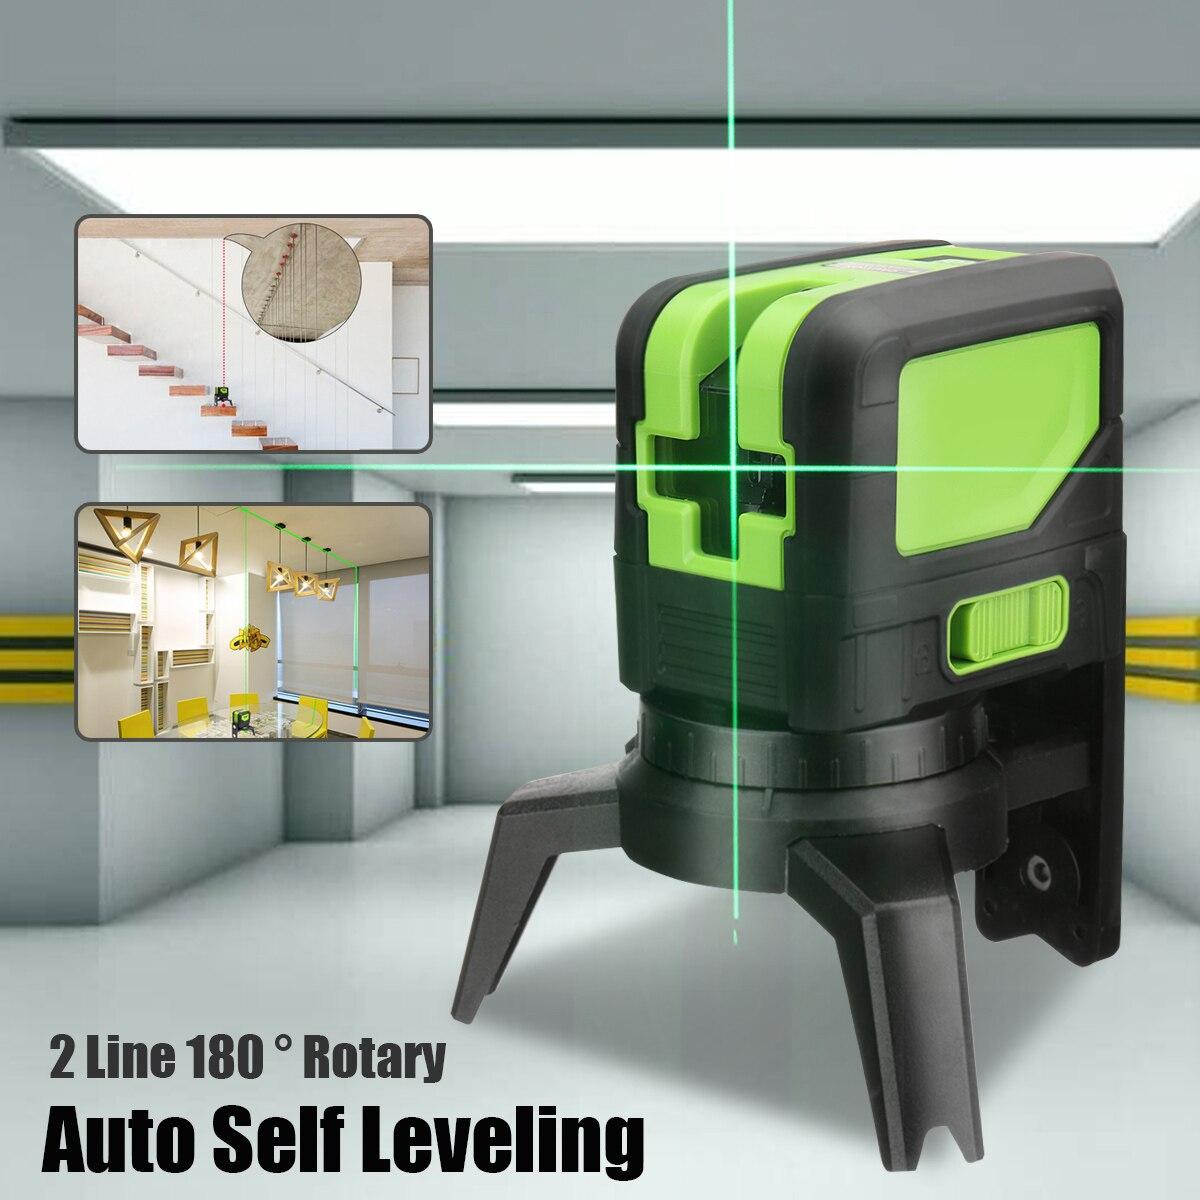 купить Mini 360 rotation 2 Lines Laser Level Auto Self Leveling Vertical and Green Beam Cross Lights Level Meter Tools по цене 4493.95 рублей